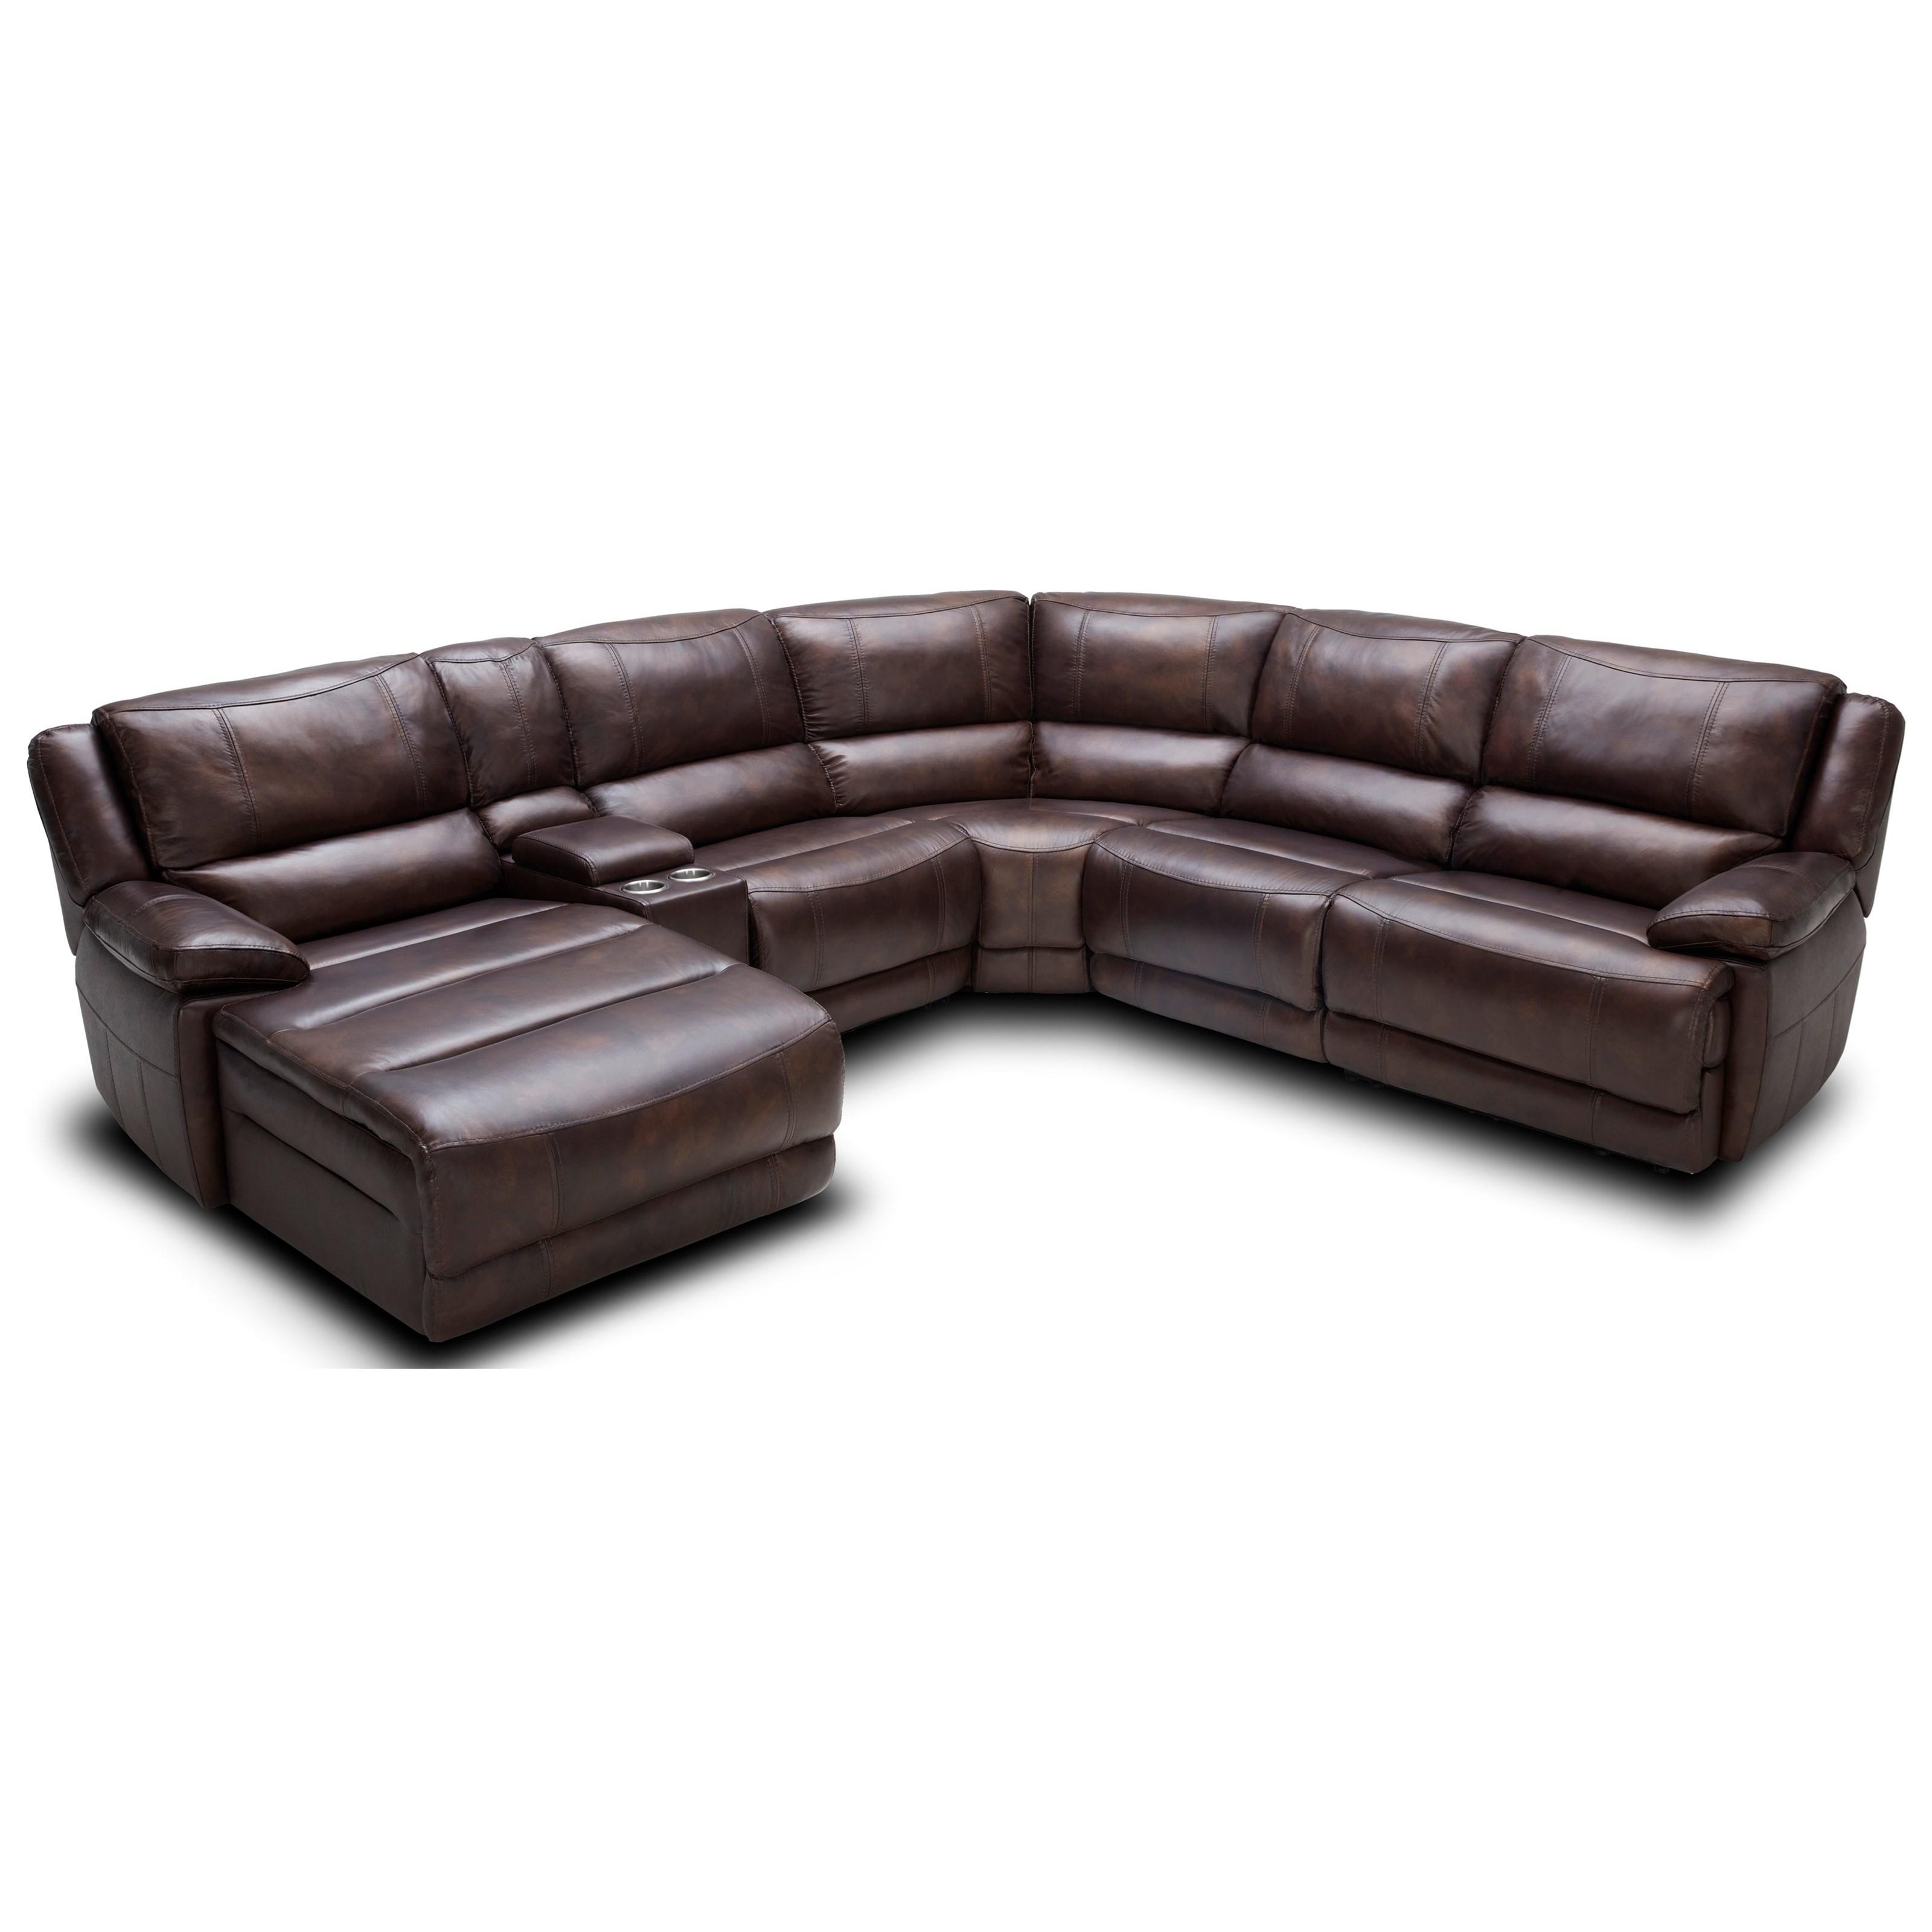 kuka home km028 six piece power reclining sectional sofa with rh sadlers com